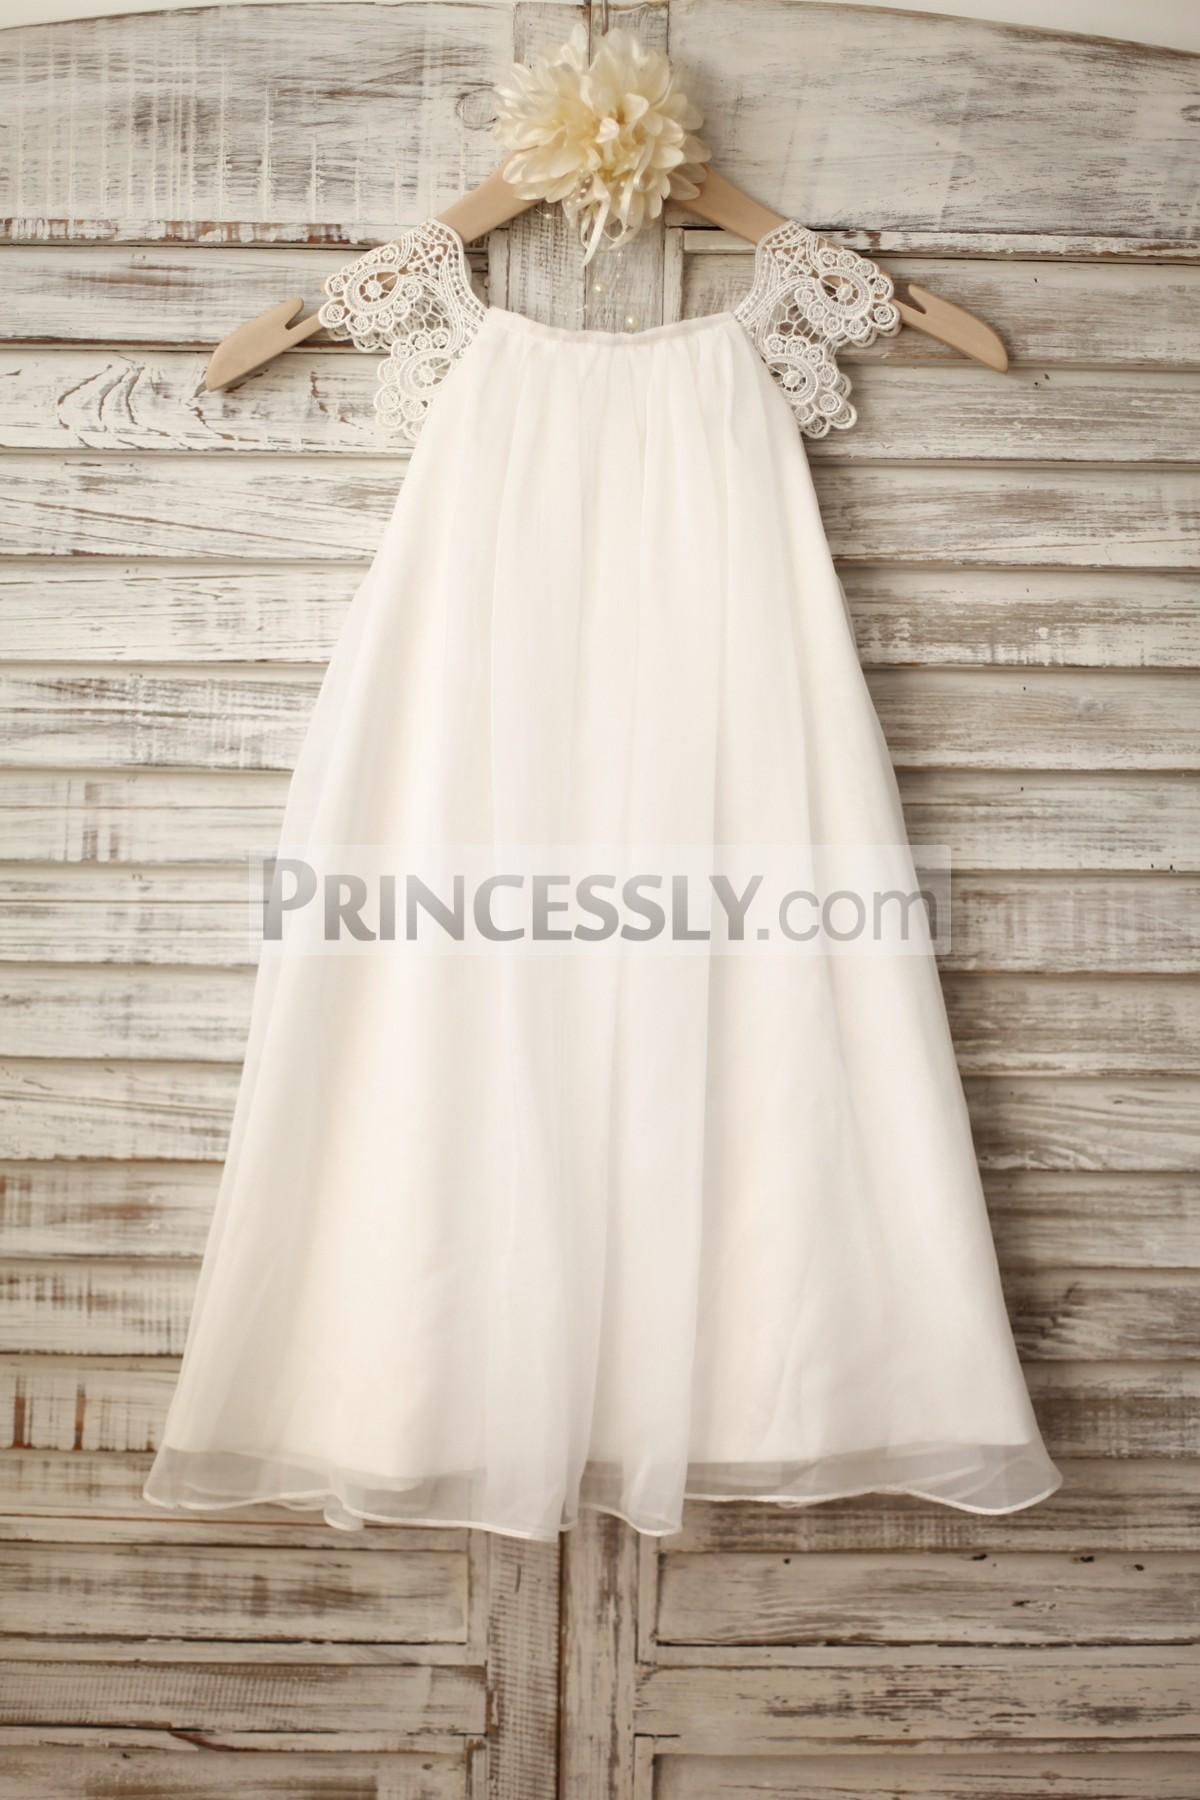 Princessly.com-K1003222-Lace Cap Sleeves Boho Beach Ivory Chiffon Flower Girl Dress-31